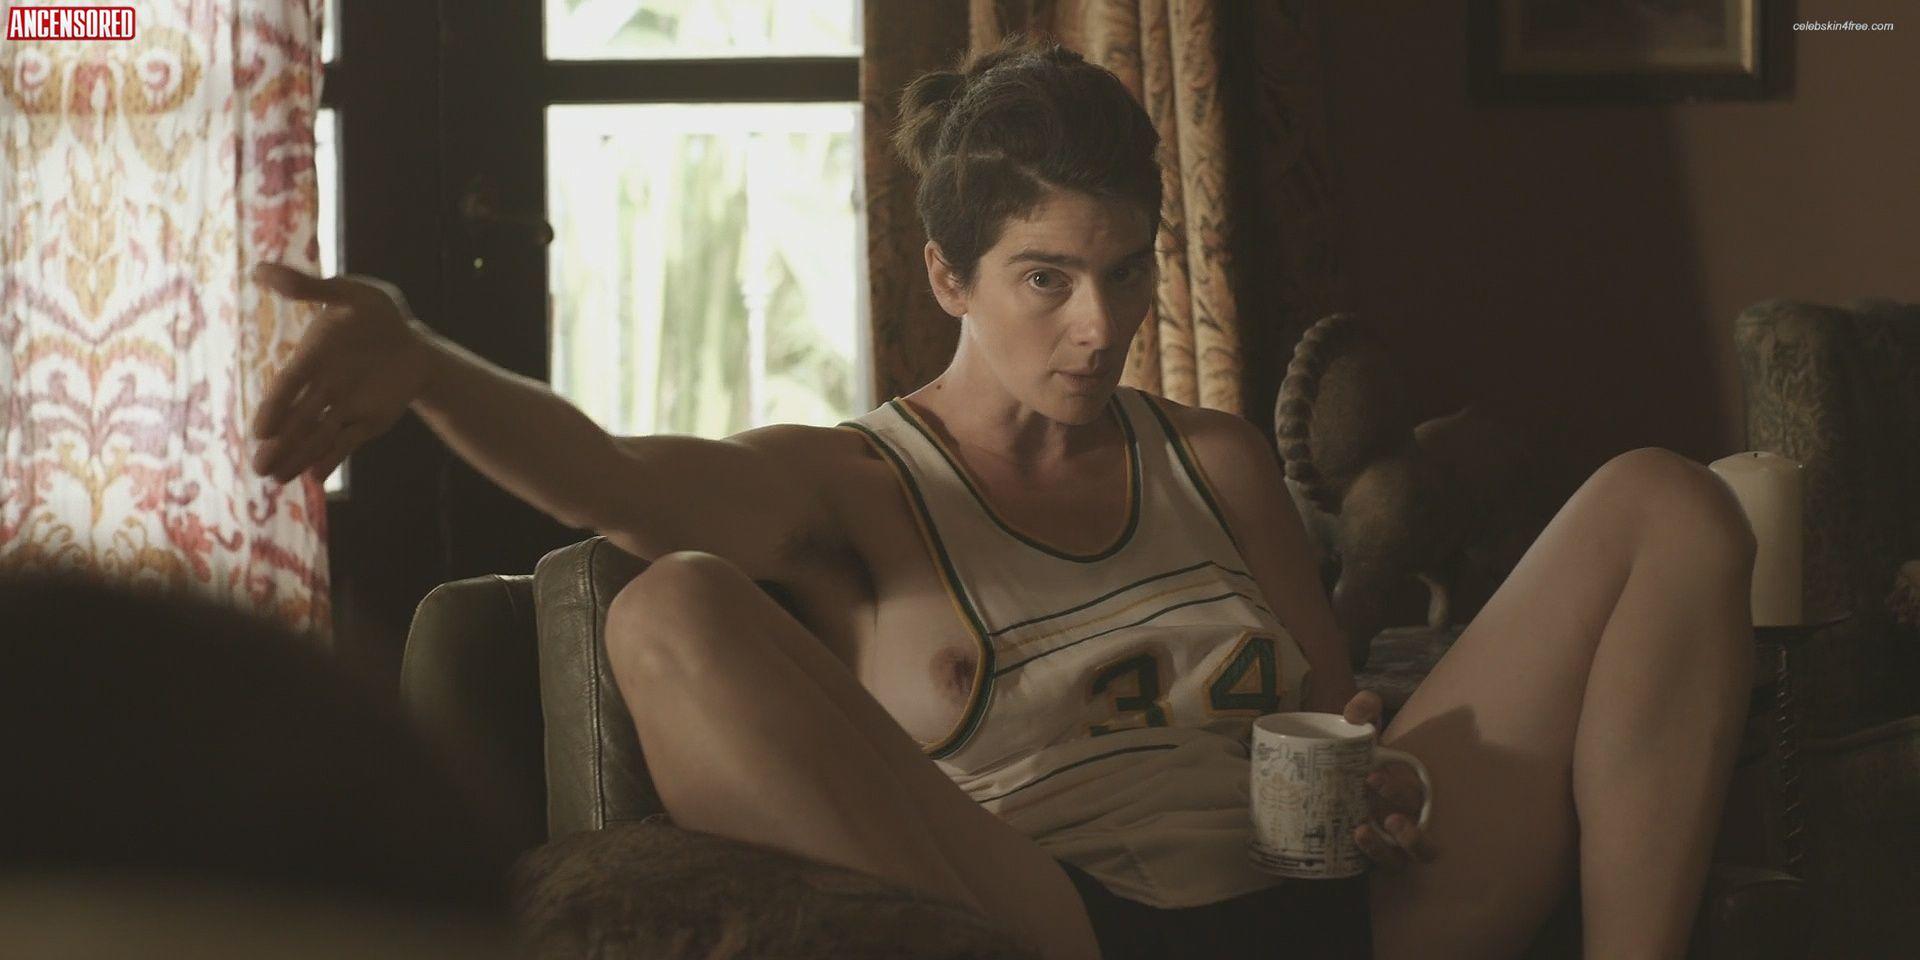 Audrey bitoni sexy girls photos XXX